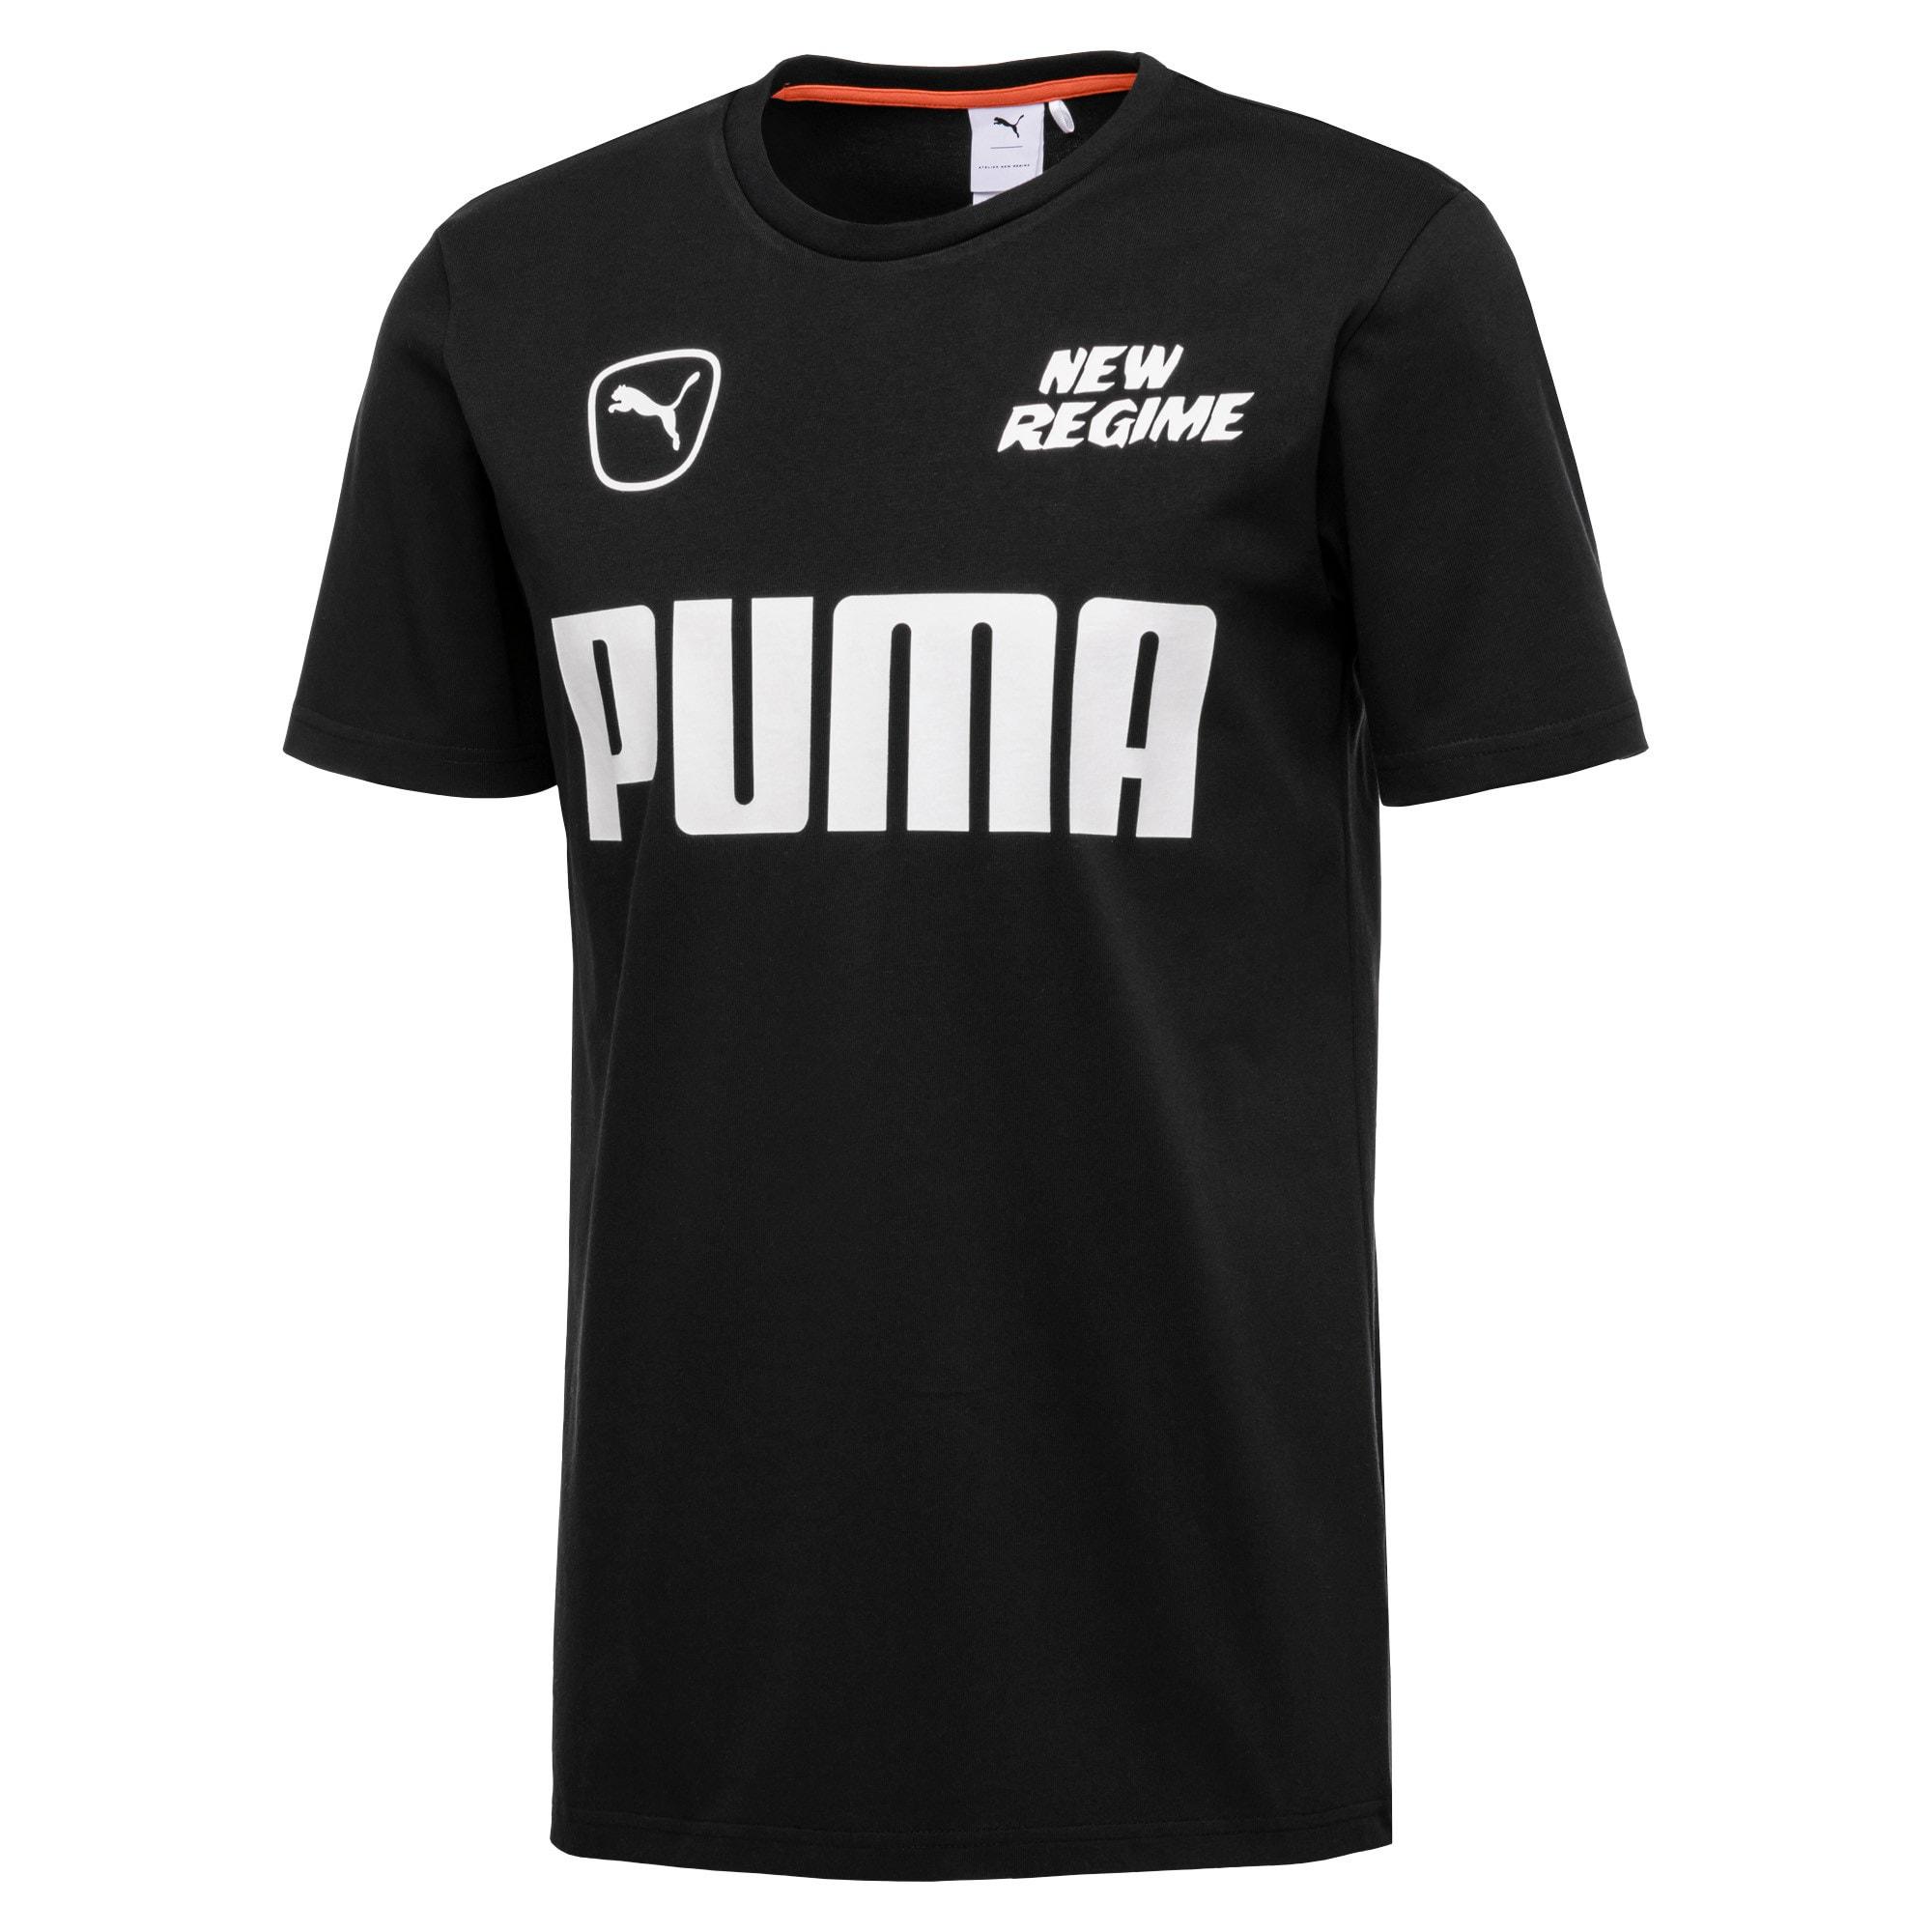 Thumbnail 1 of PUMA x ATELIER NEW REGIME Men's Tee, Puma Black, medium